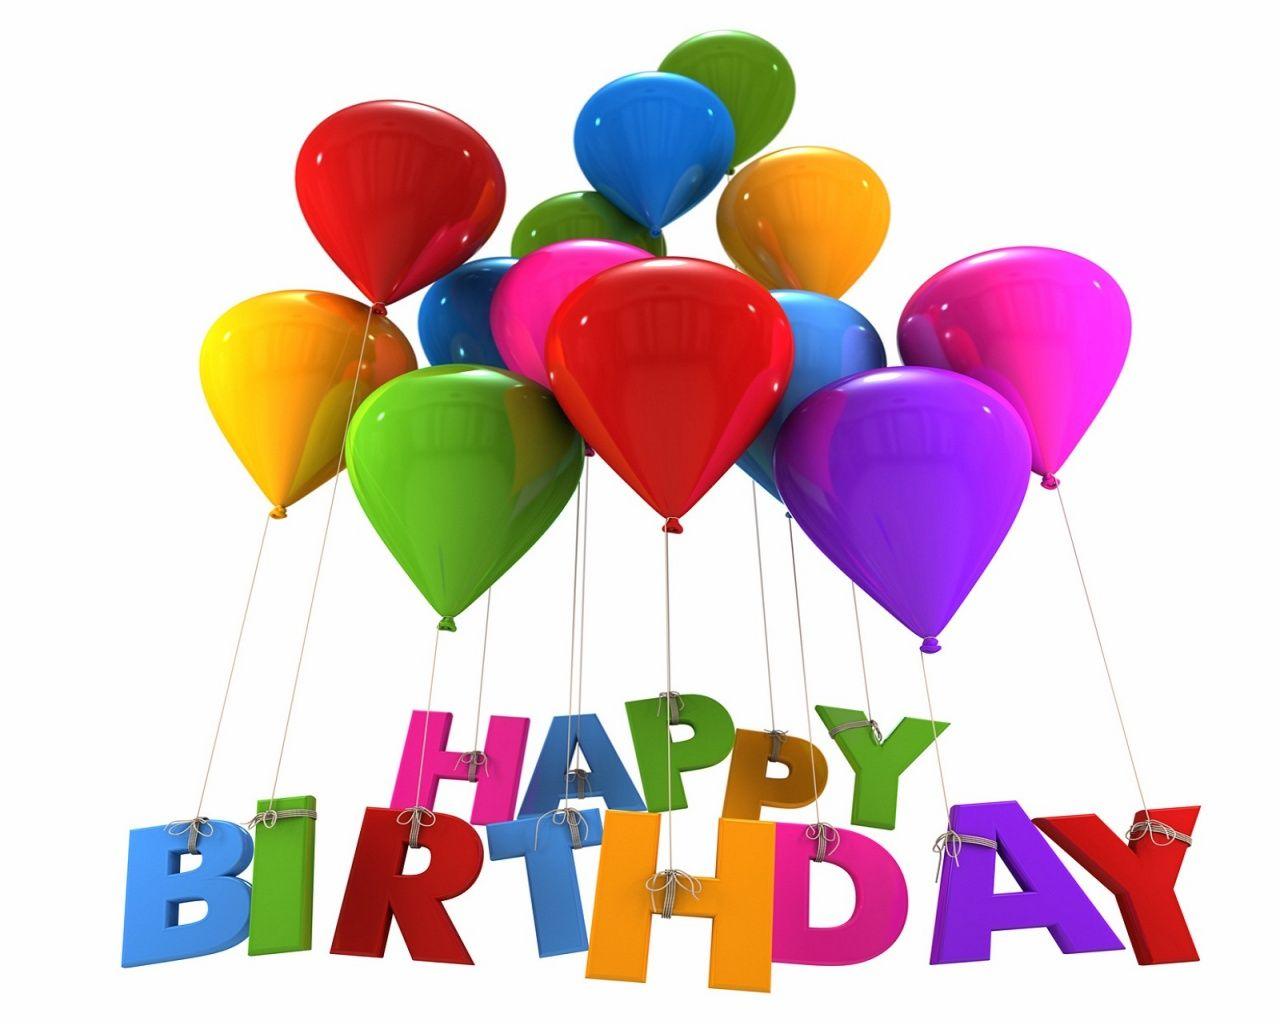 Ballon for birthday birthday balloons hd wallpapers and - Happy birthday balloon images hd ...